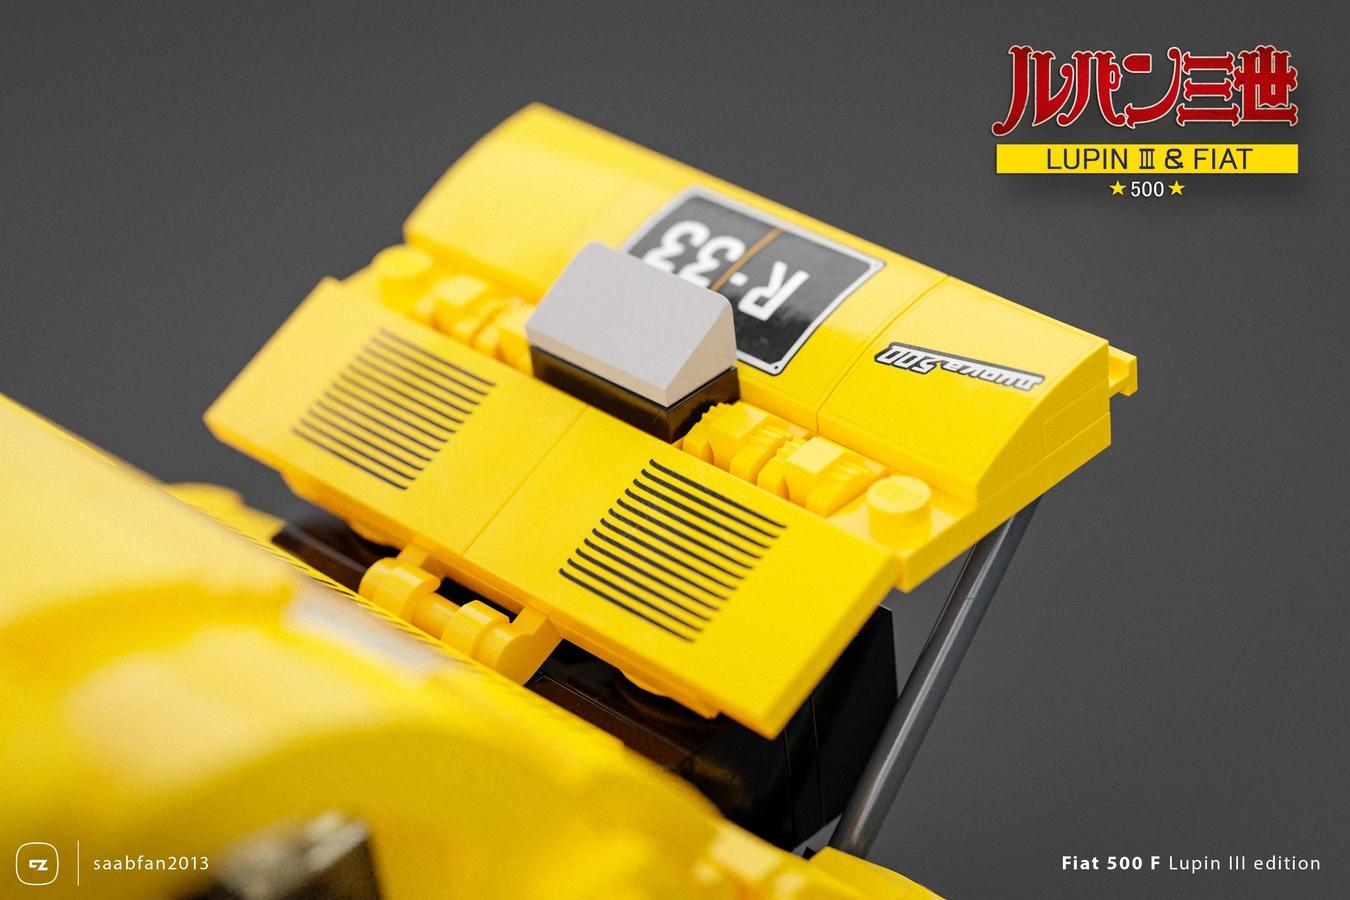 Lego Ideas -